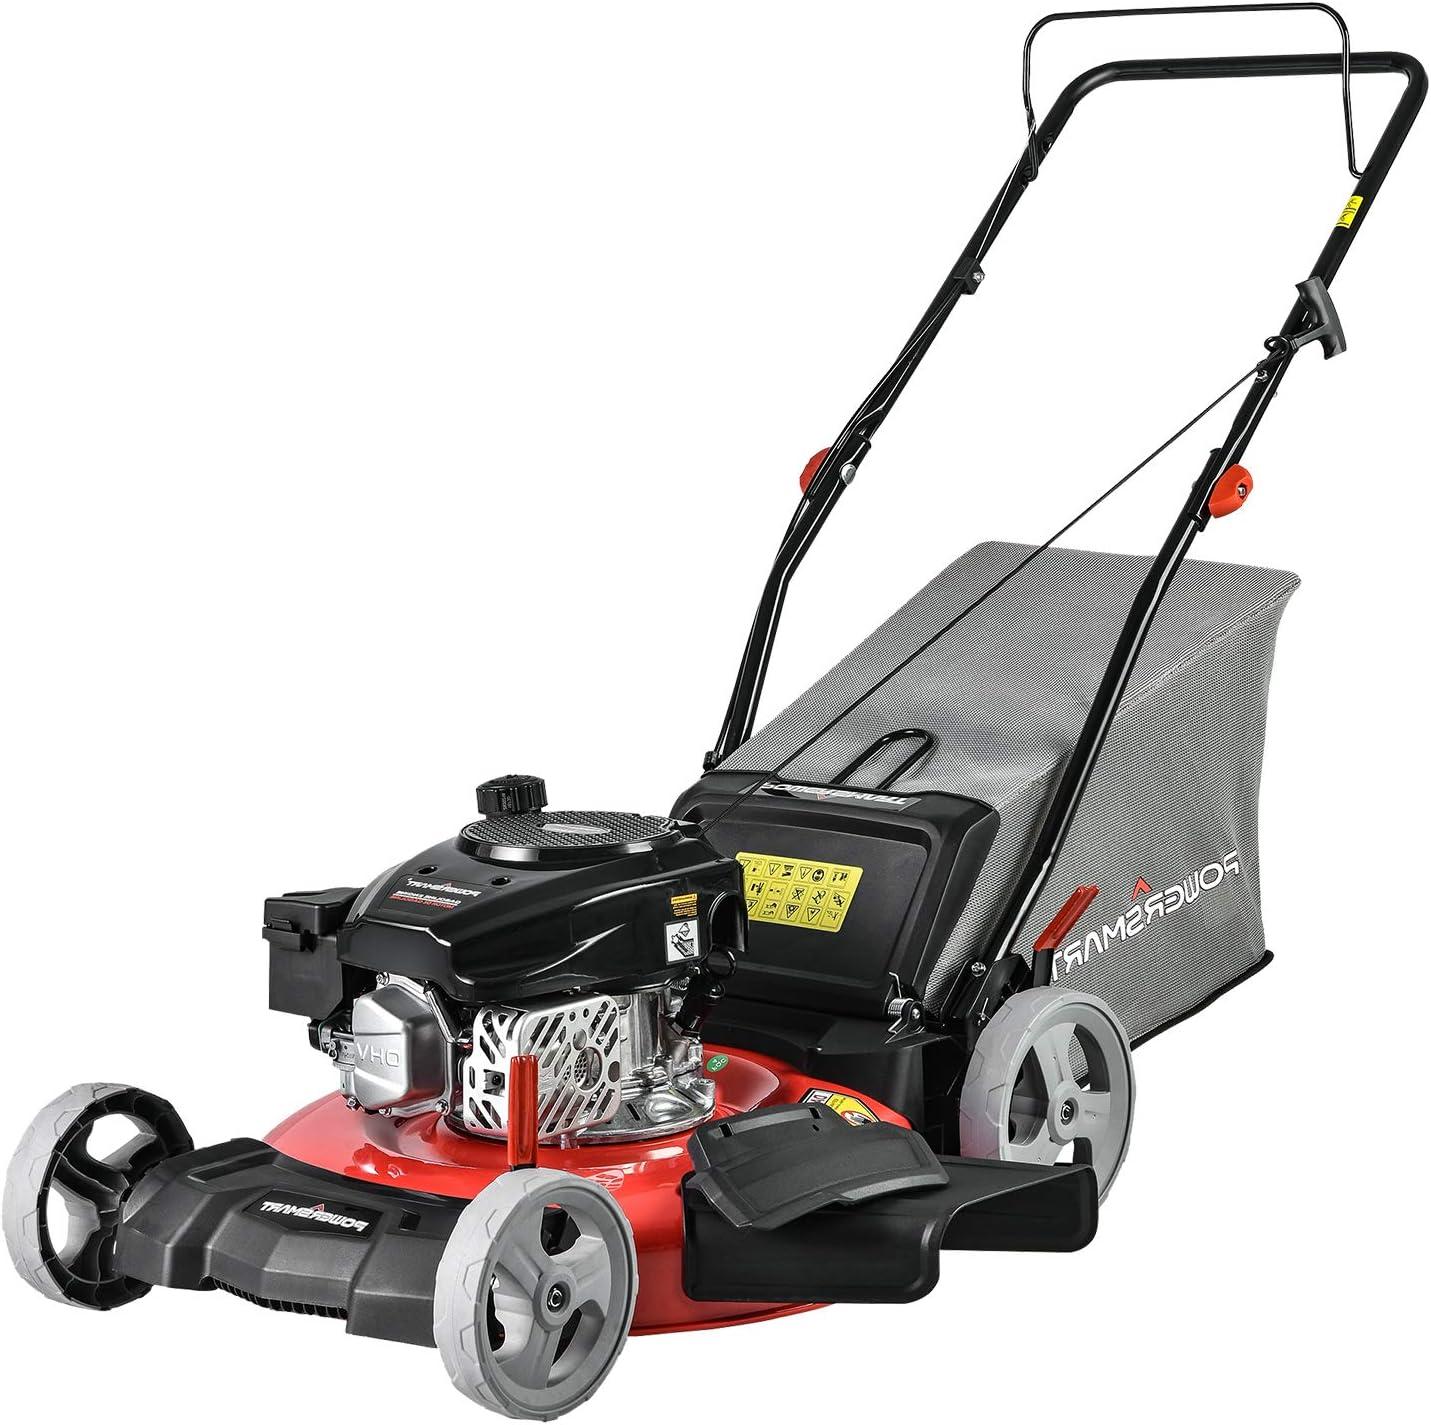 PowerSmart Gas Powered Lawn Mower, 21-inch & 170CC